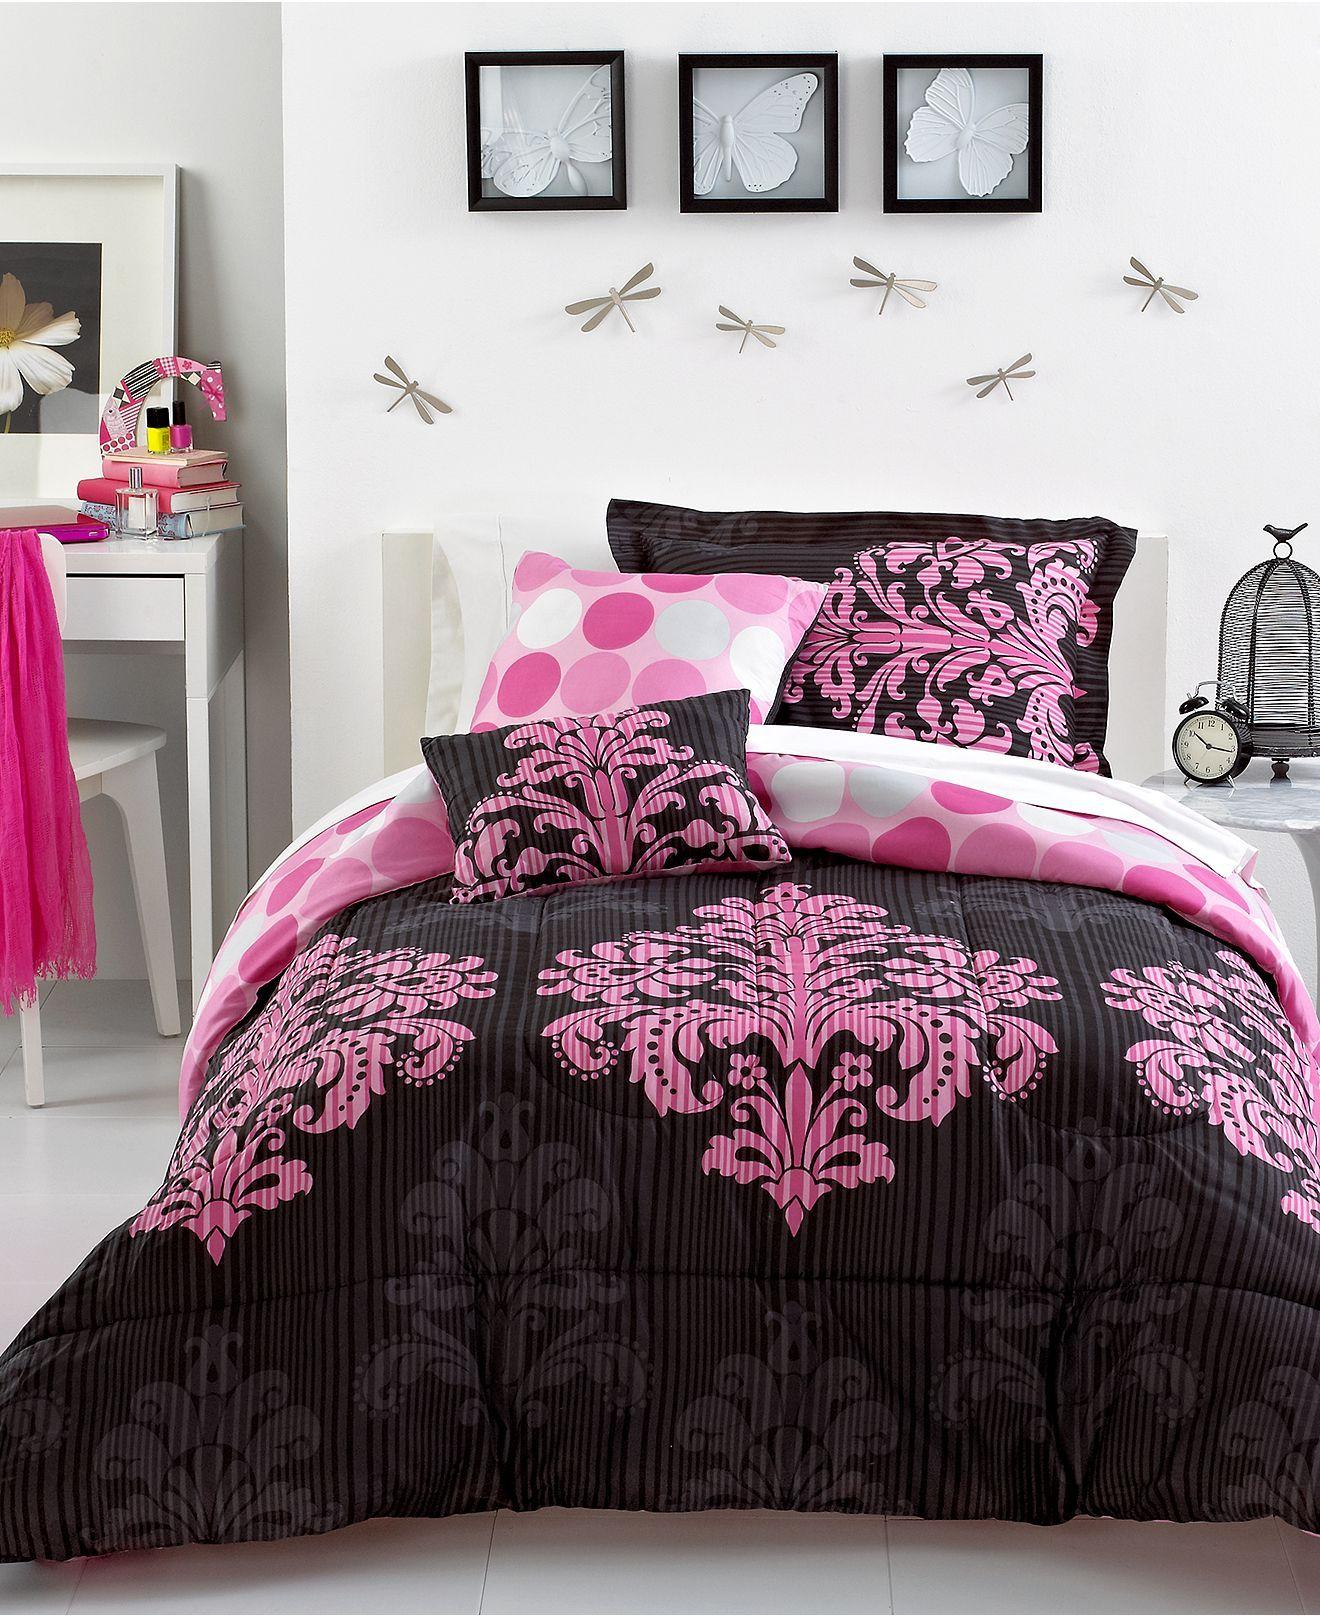 Matador 5 Piece forter Sets Bed in a Bag Bed & Bath Macy s